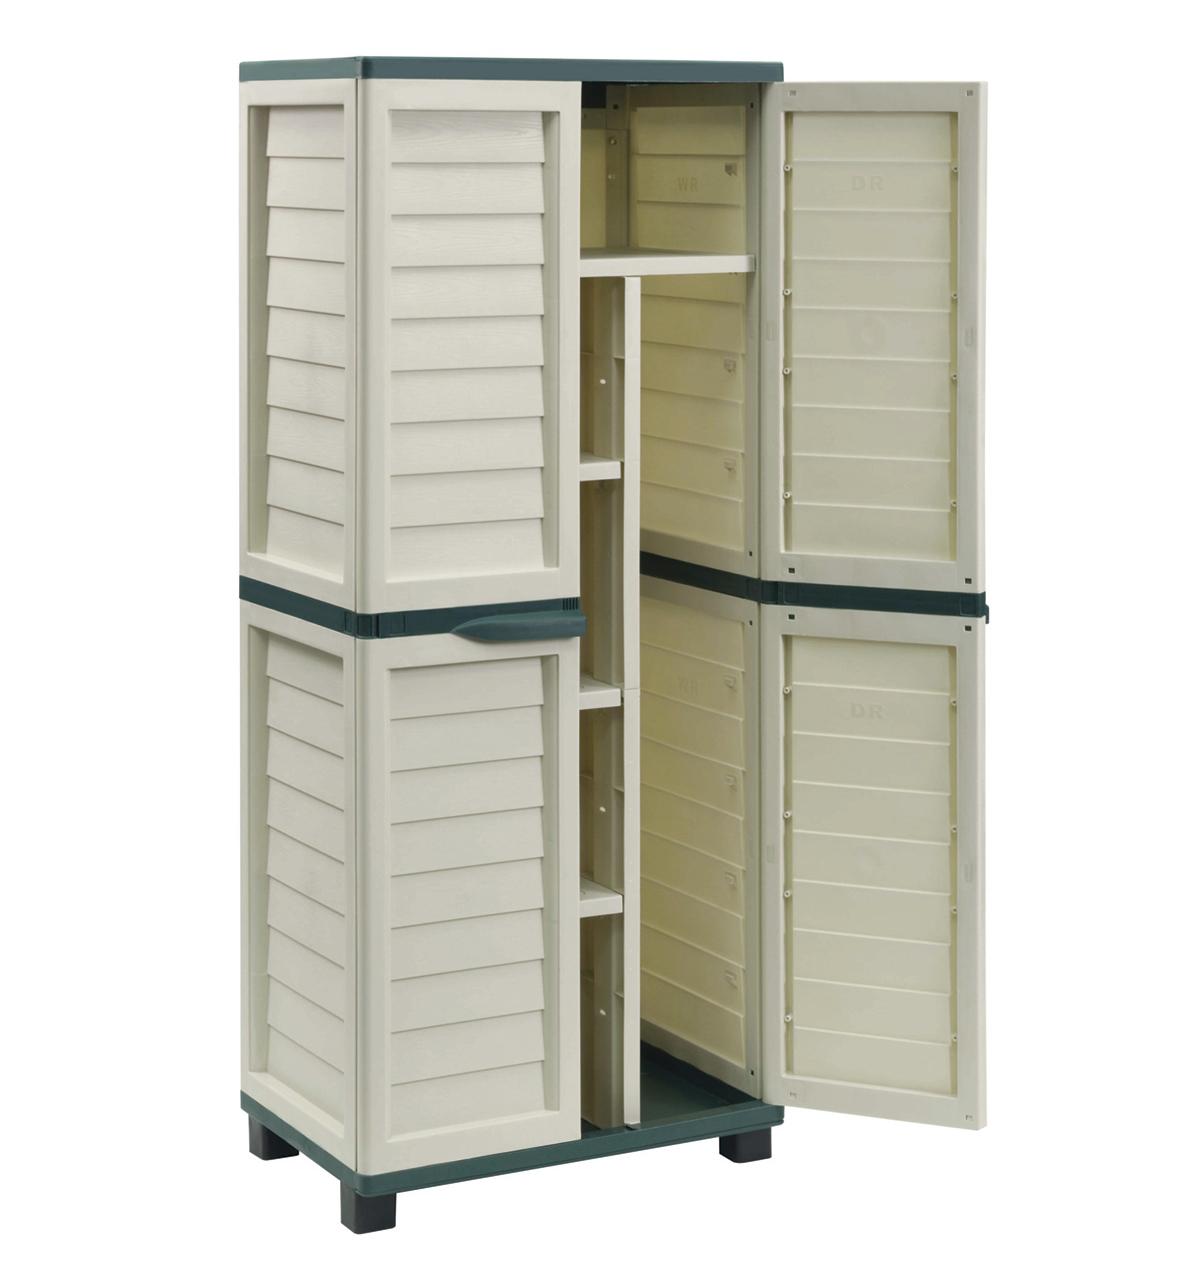 armoire de jardin en r sine gardiun clothes hanging storage gardiun. Black Bedroom Furniture Sets. Home Design Ideas